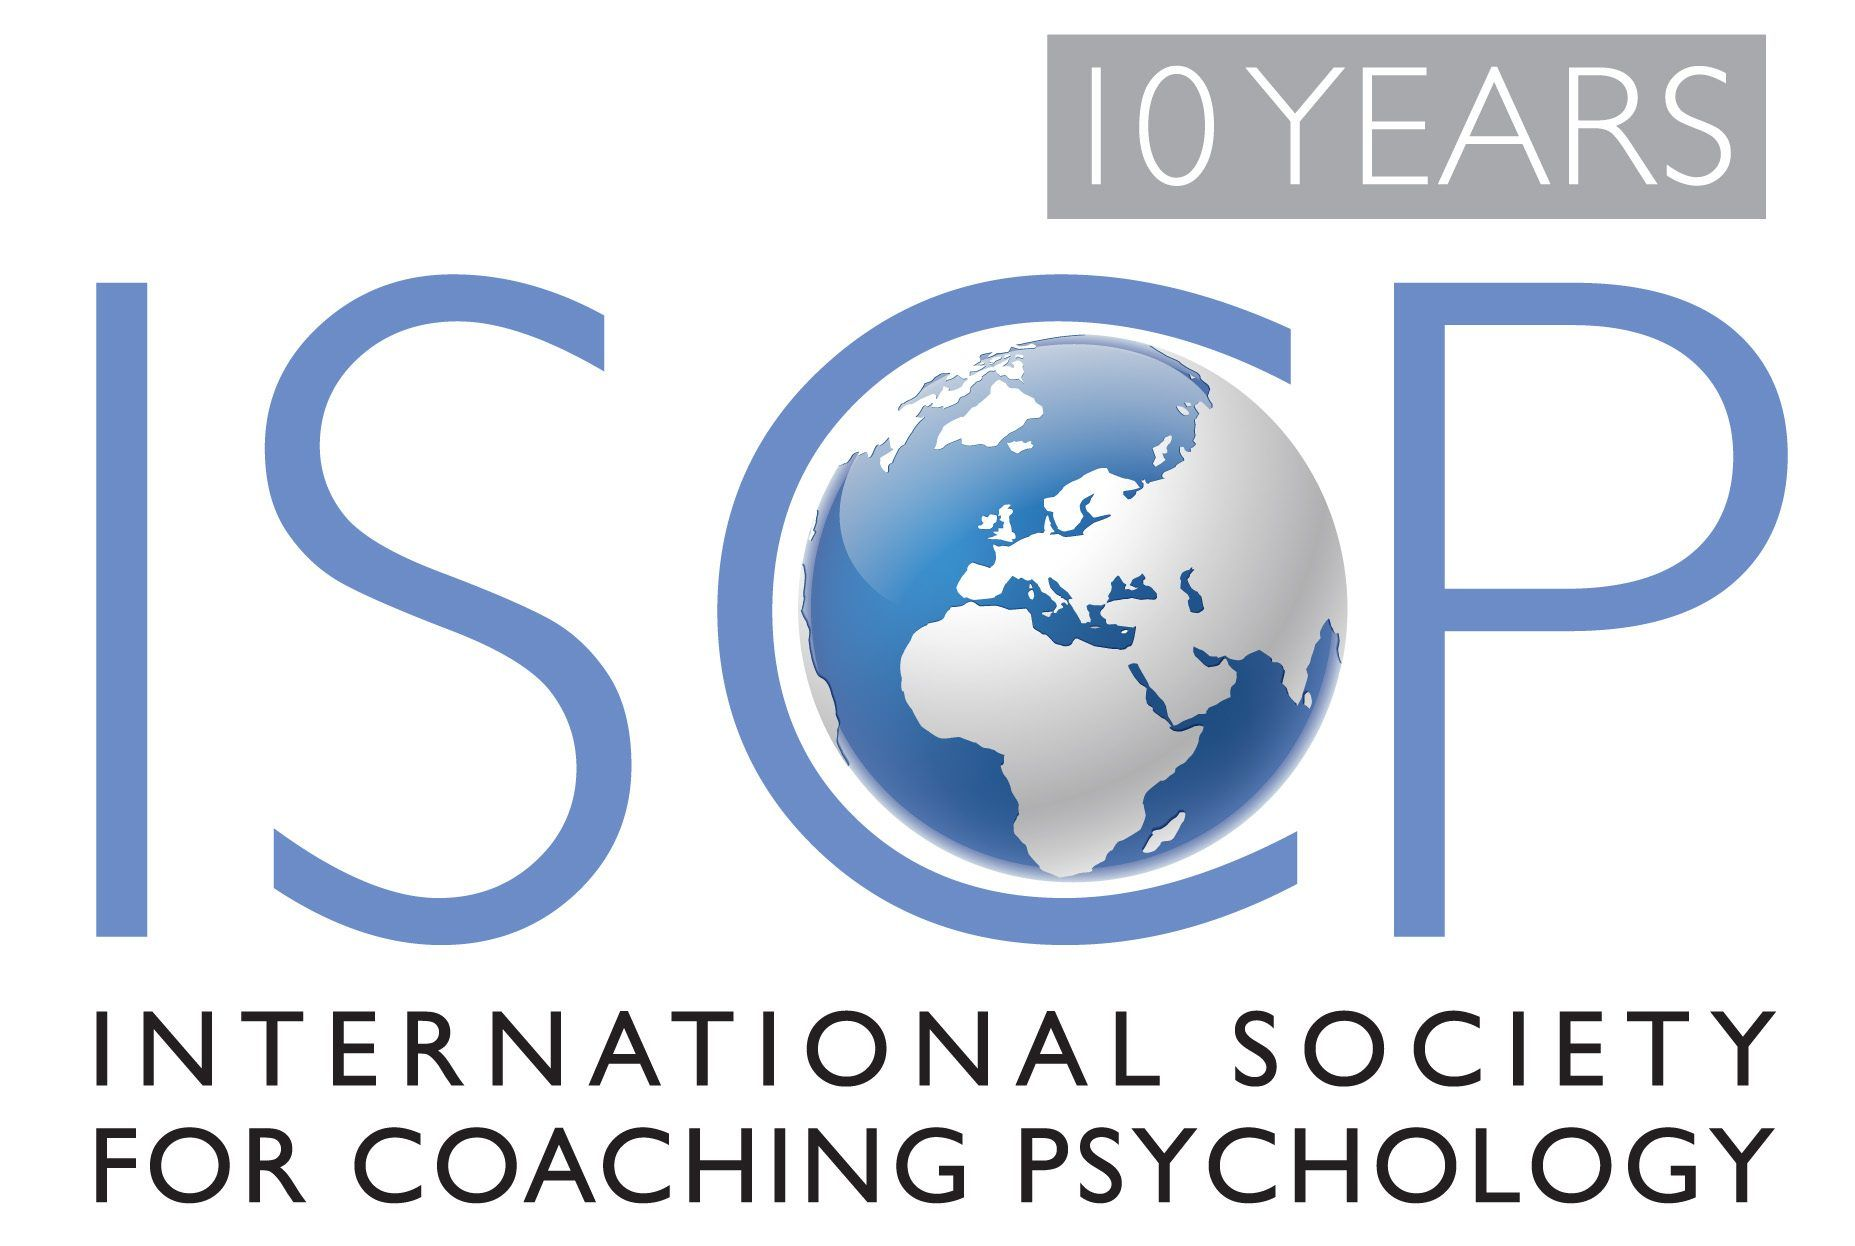 International Society for Coaching Psychology Promoting